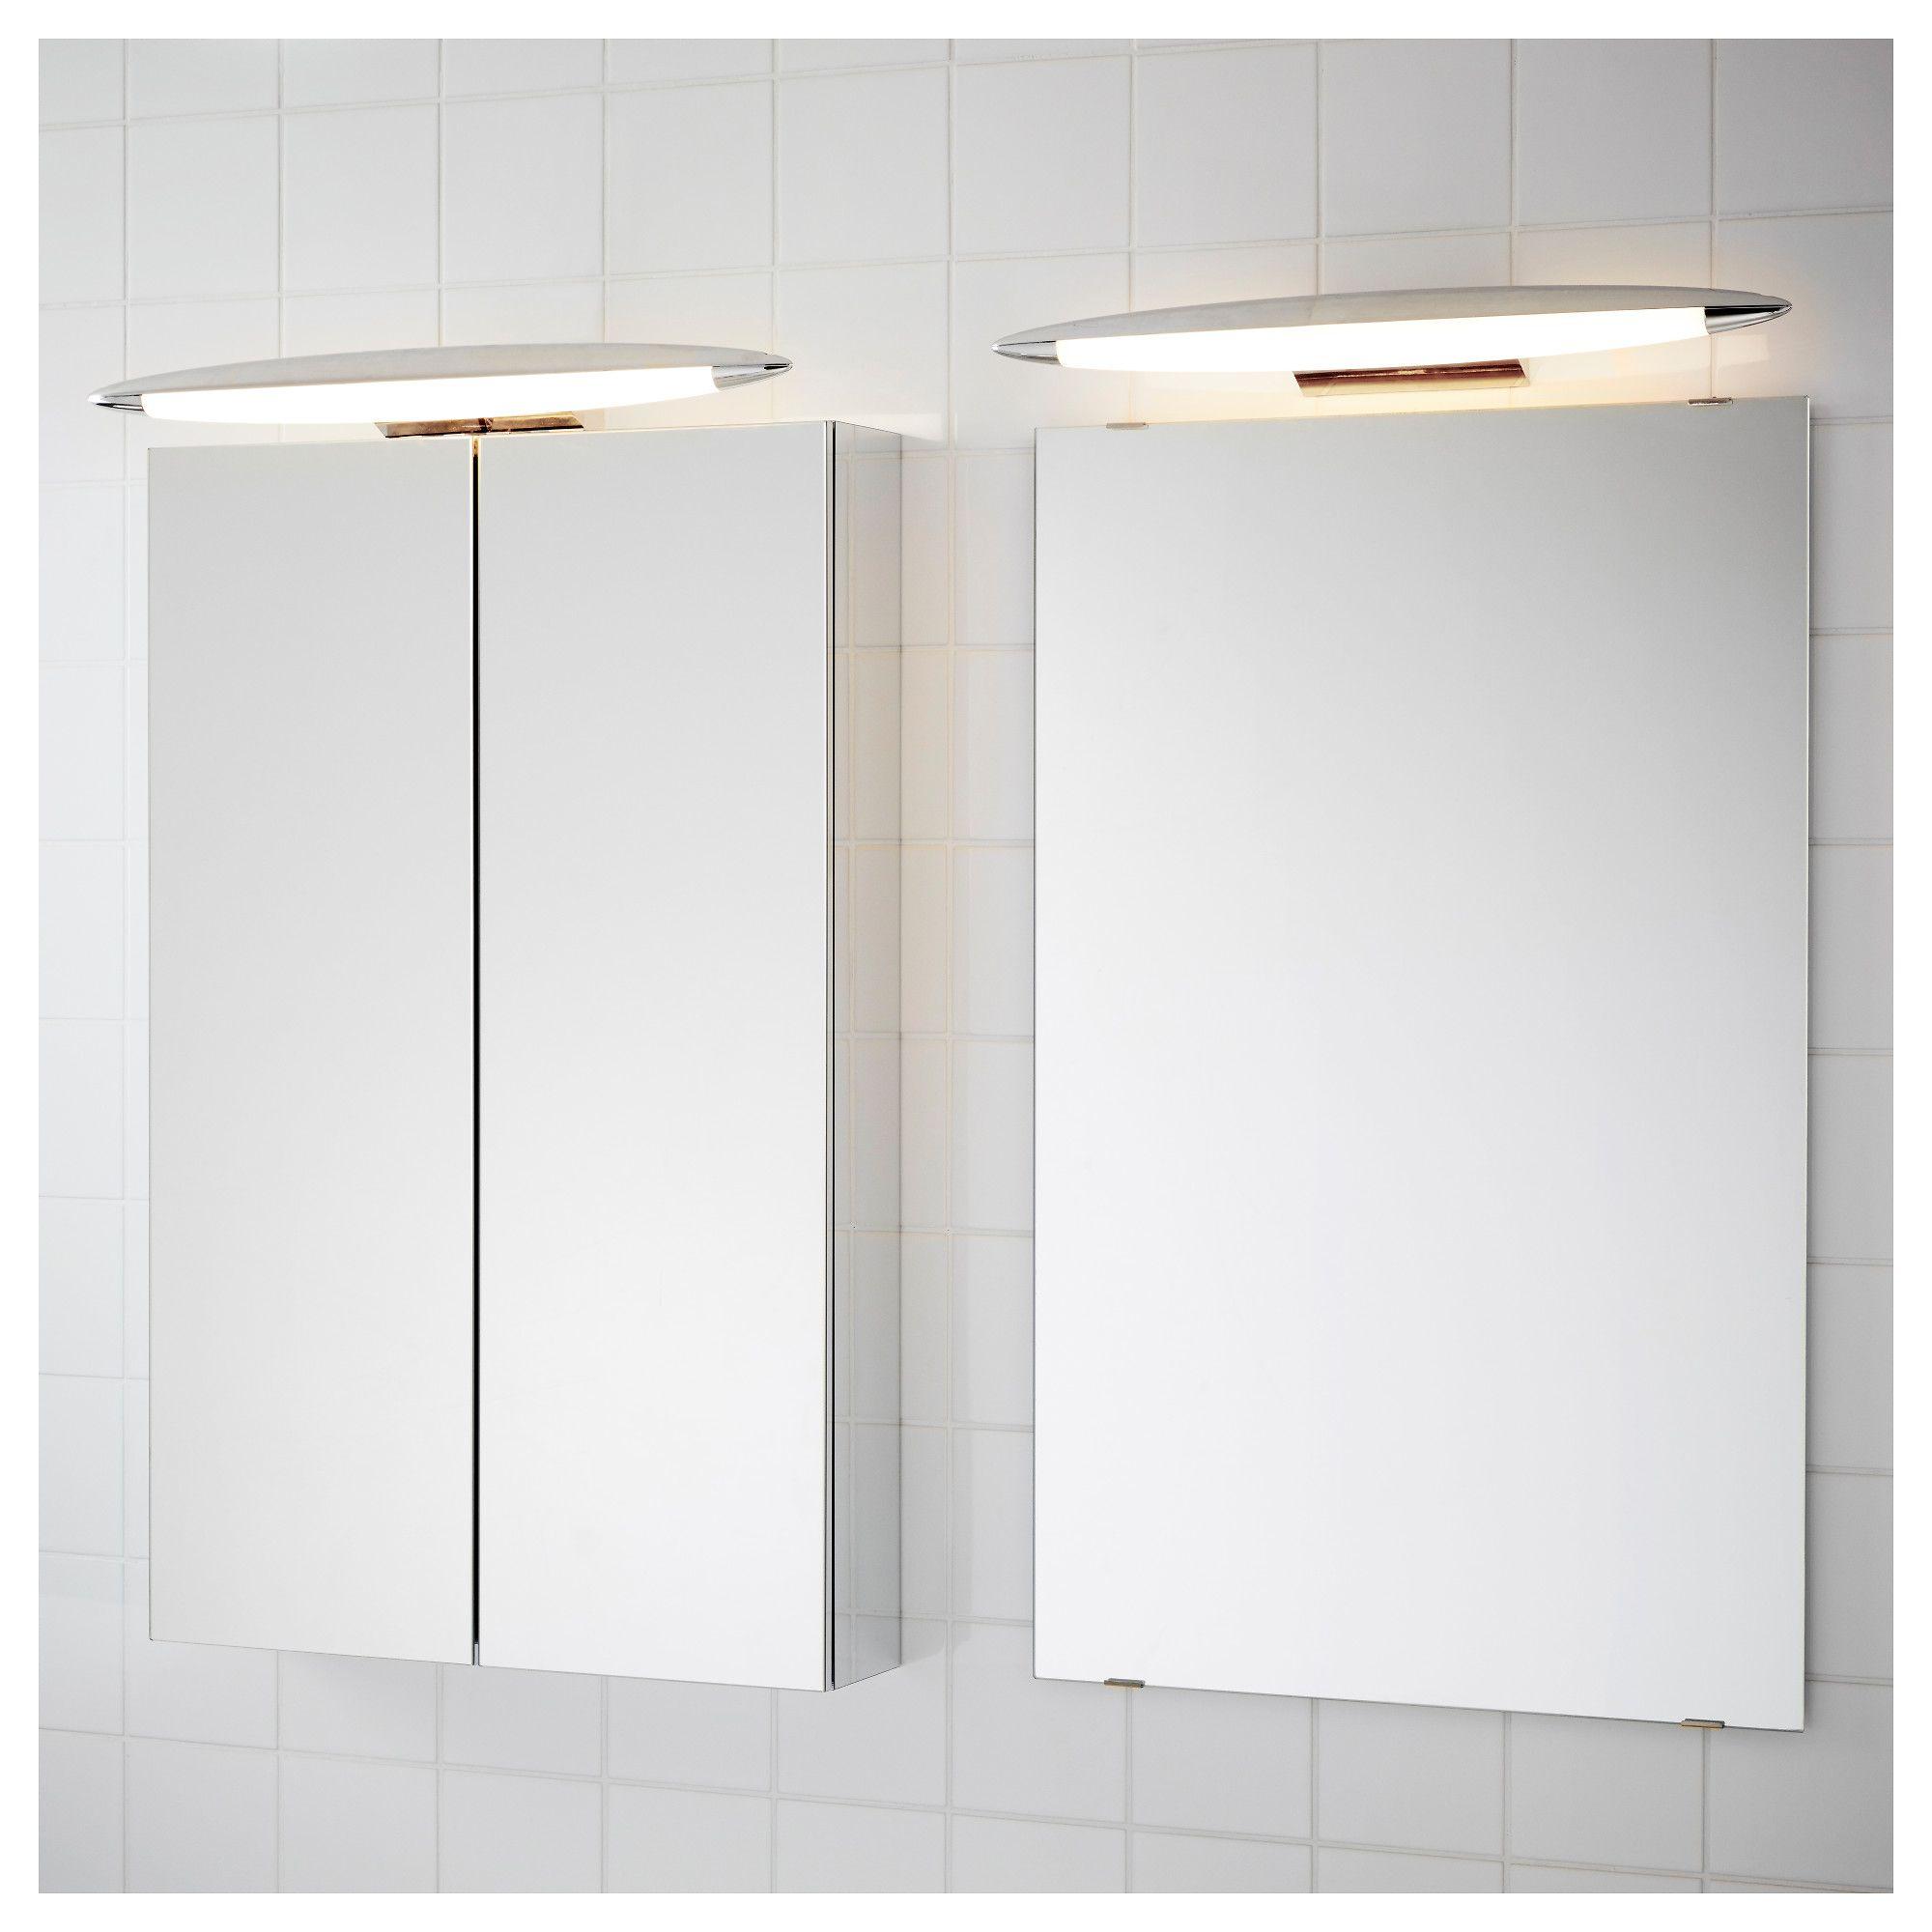 wall lighting ikea. SKEPP LED Cabinet/wall Lighting - IKEA Wall Ikea M